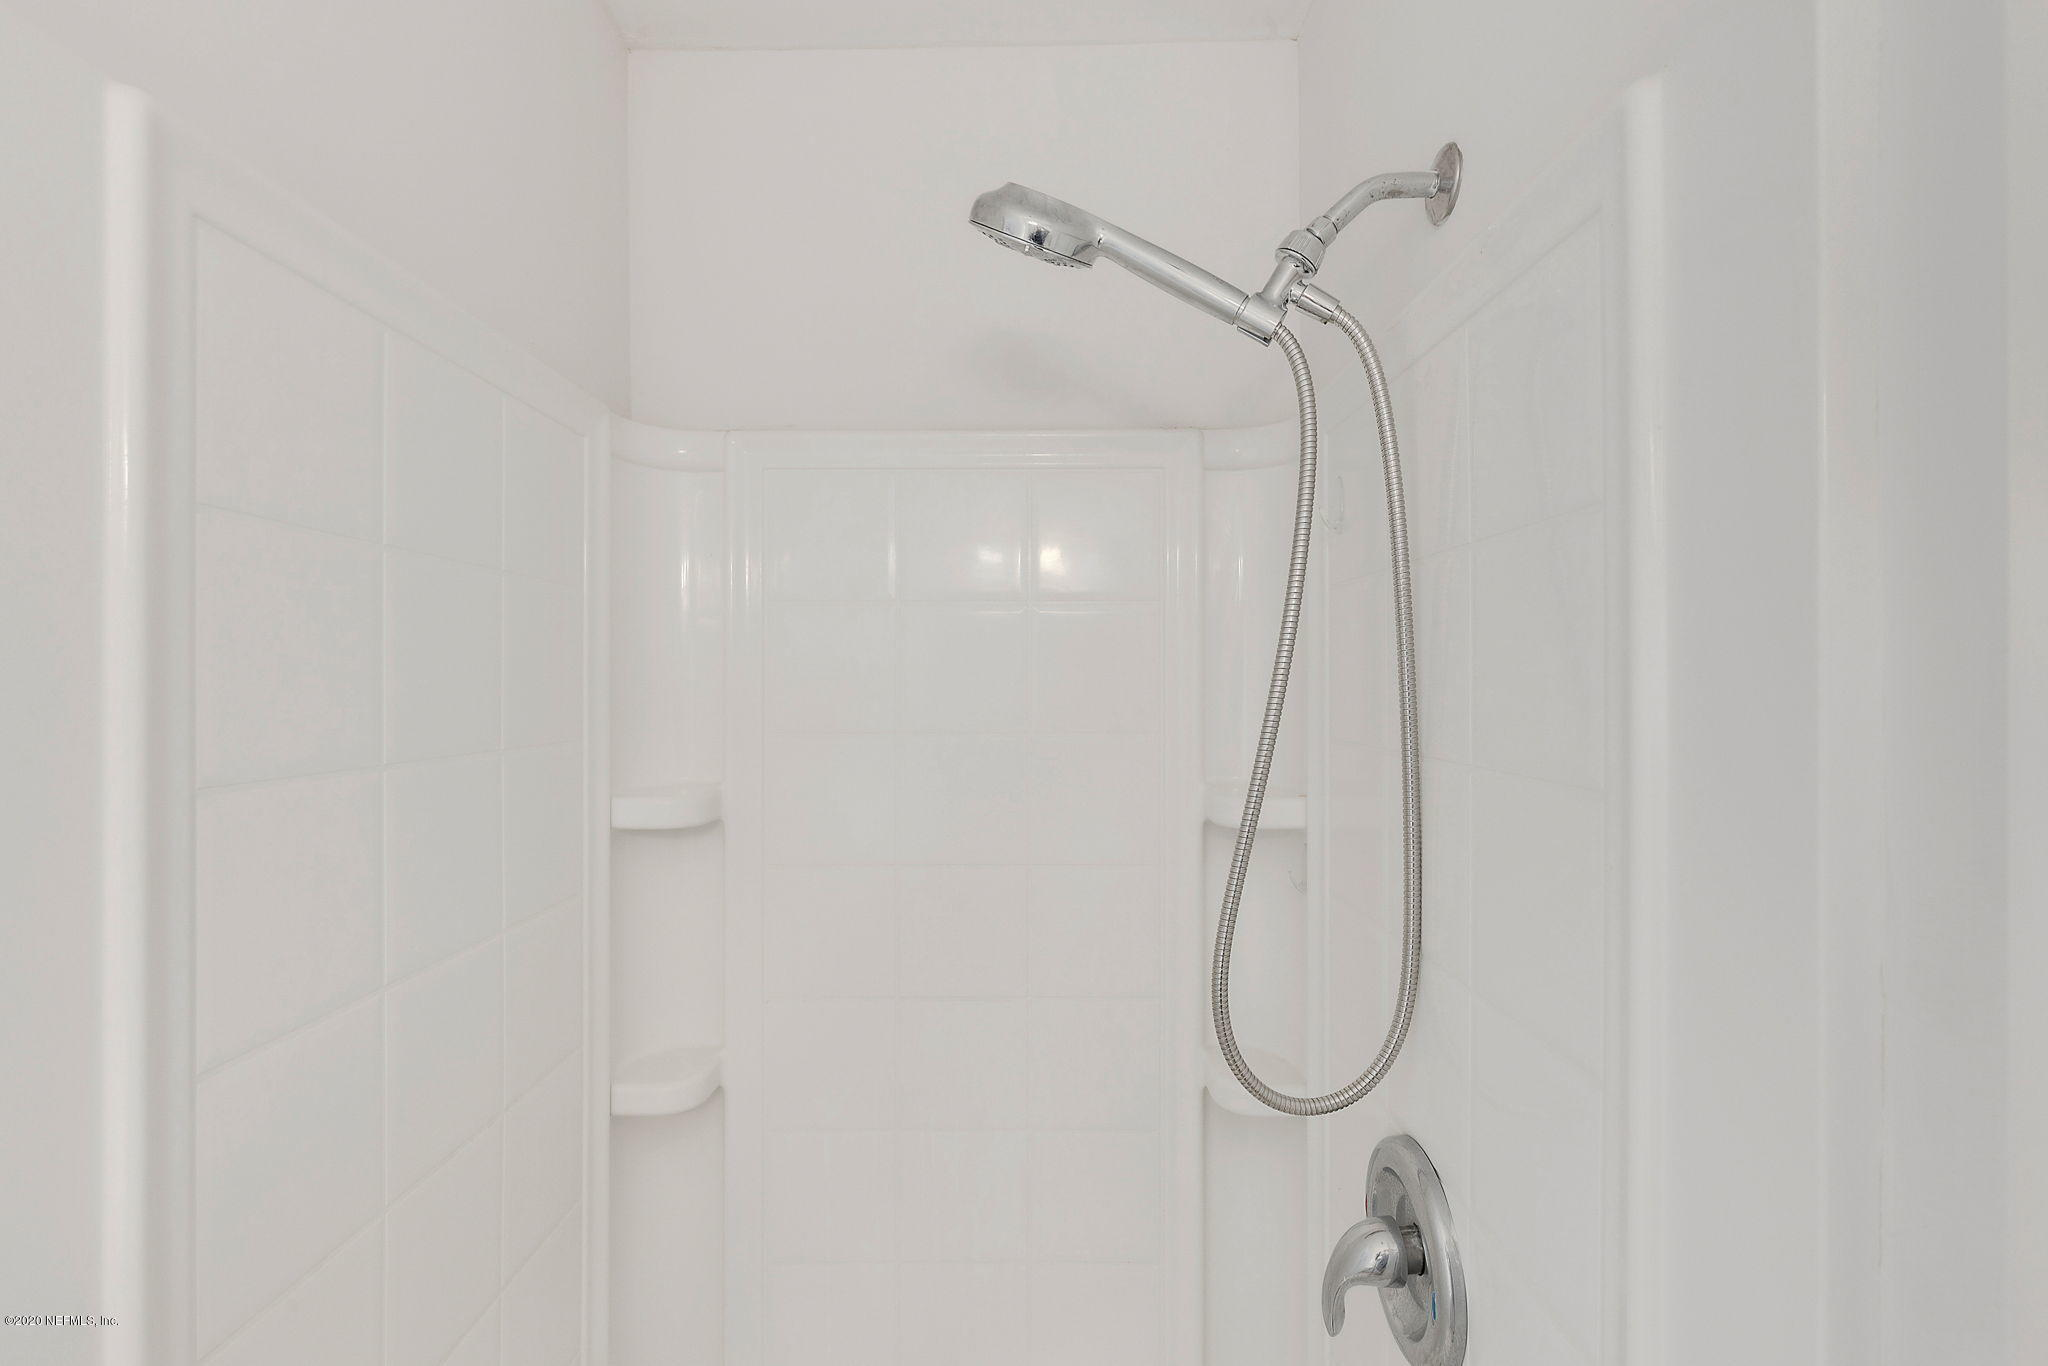 4964 LOFTY PINES, JACKSONVILLE, FLORIDA 32210, 3 Bedrooms Bedrooms, ,2 BathroomsBathrooms,Residential,For sale,LOFTY PINES,1082601